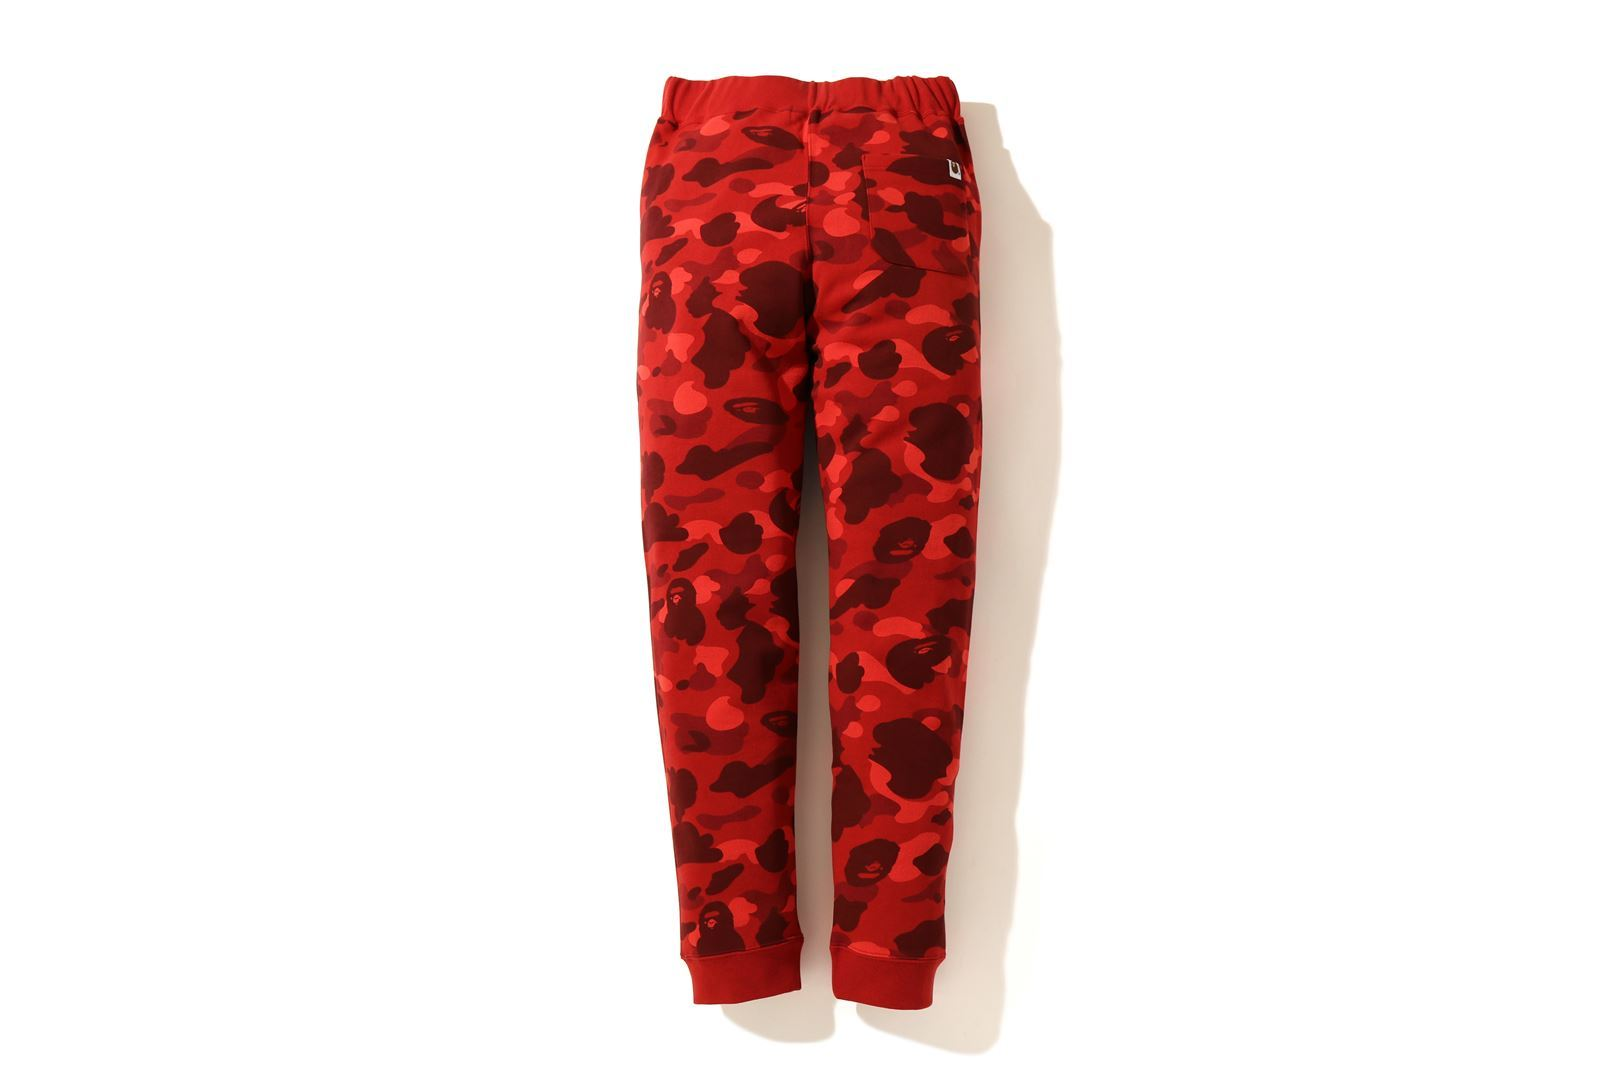 COLOR CAMO TIGER SLIM SWEAT PANTS_a0174495_13510767.jpg